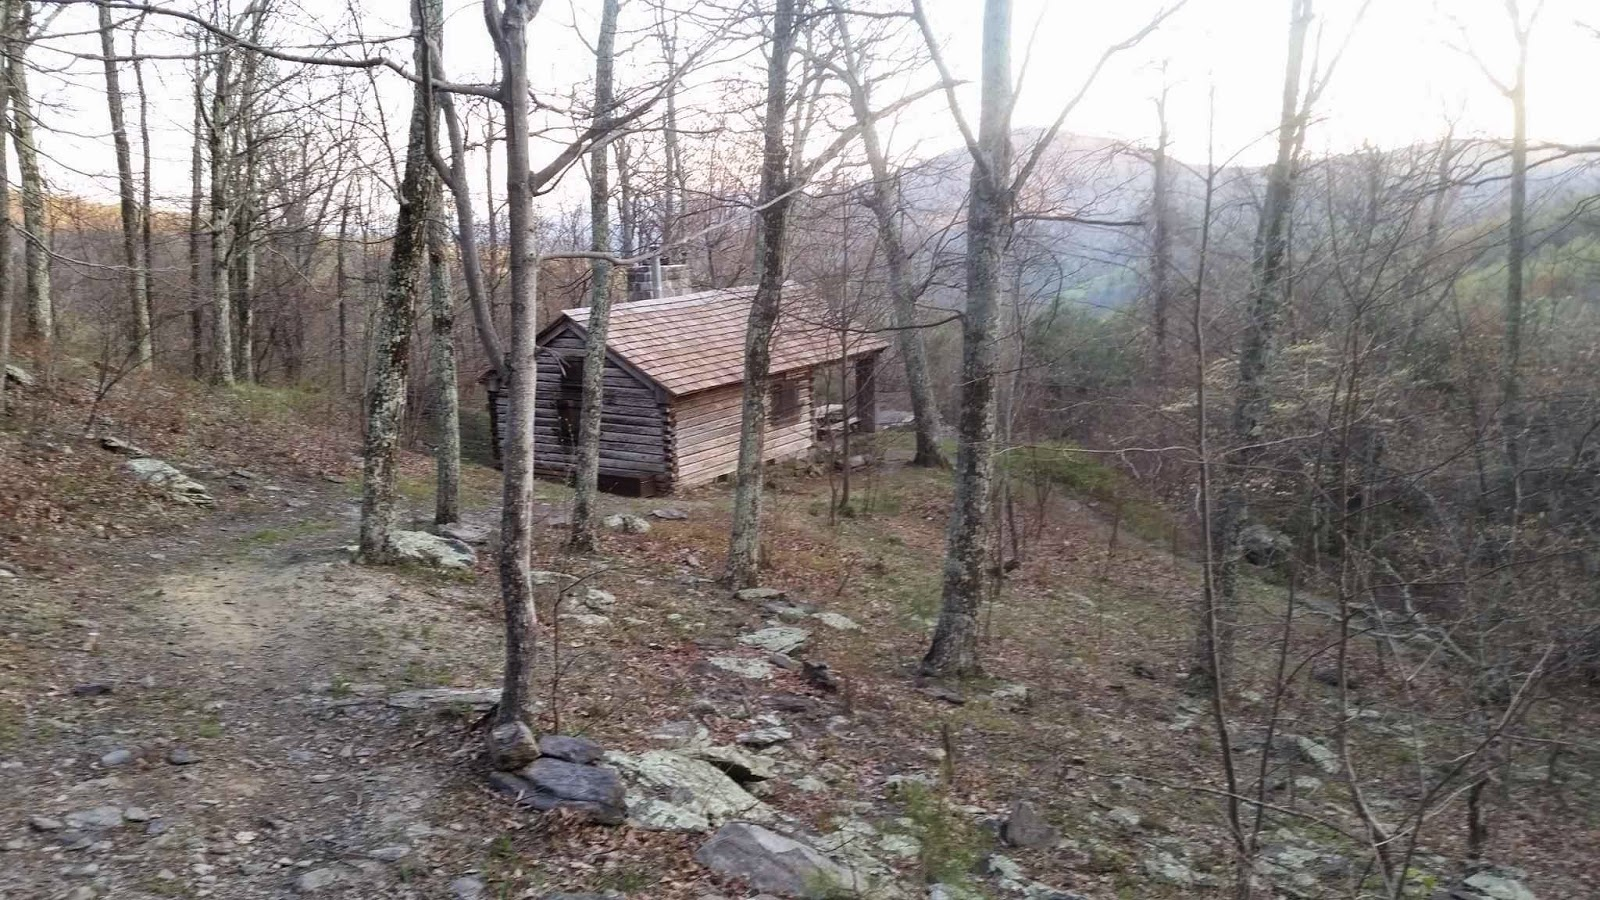 Doyles River Cabin